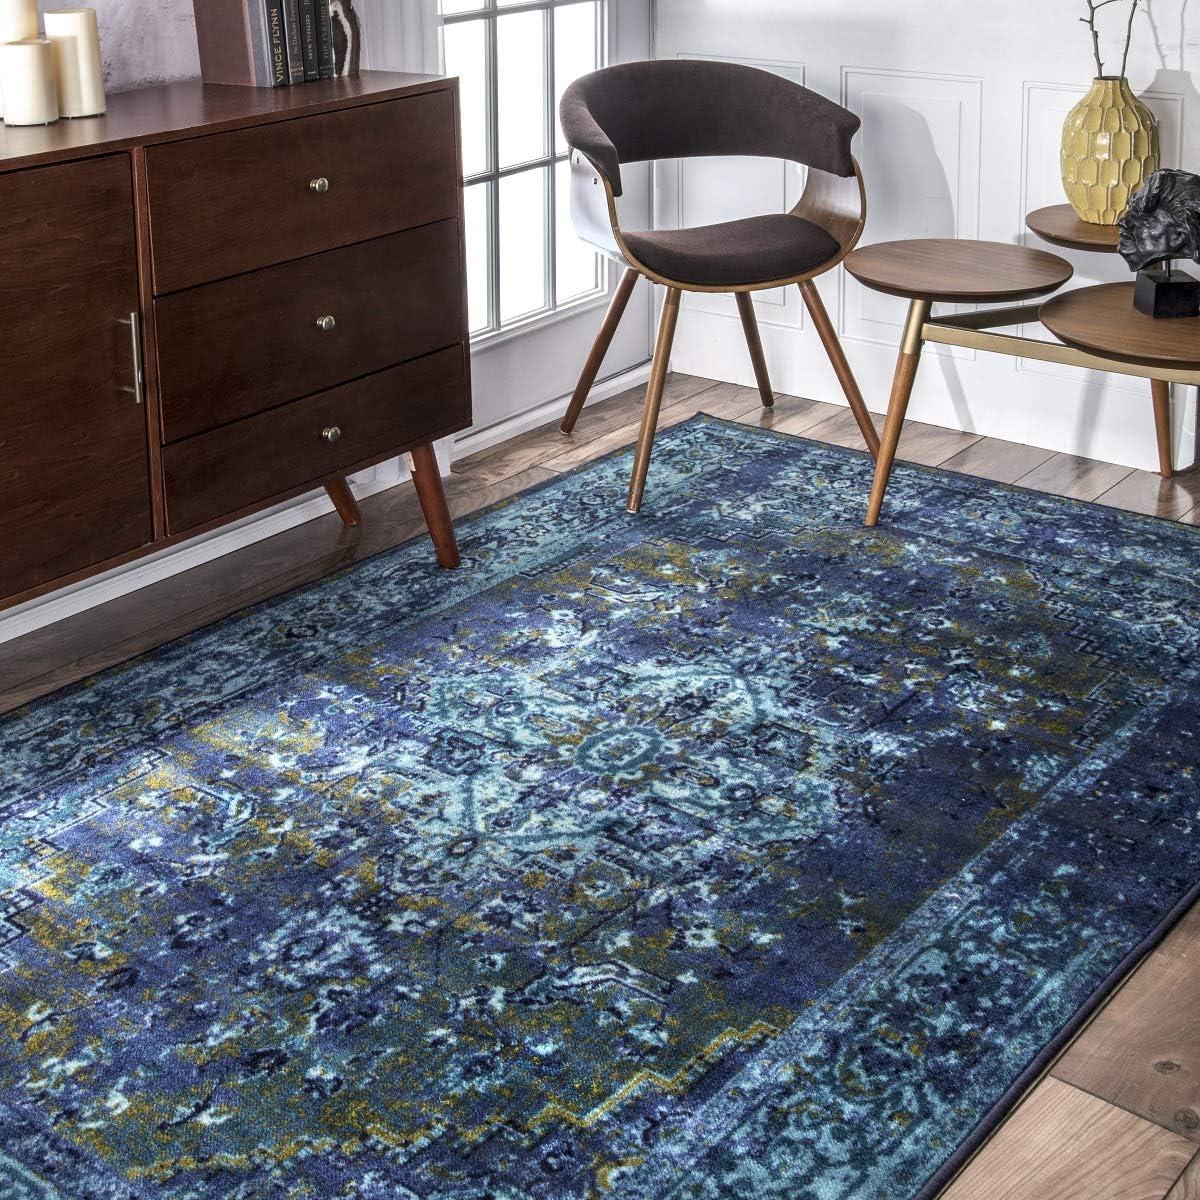 nuLOOM 200MCGZ01C-8010 Reiko Vintage Persian Area Rug, 8 x 10 , Blue